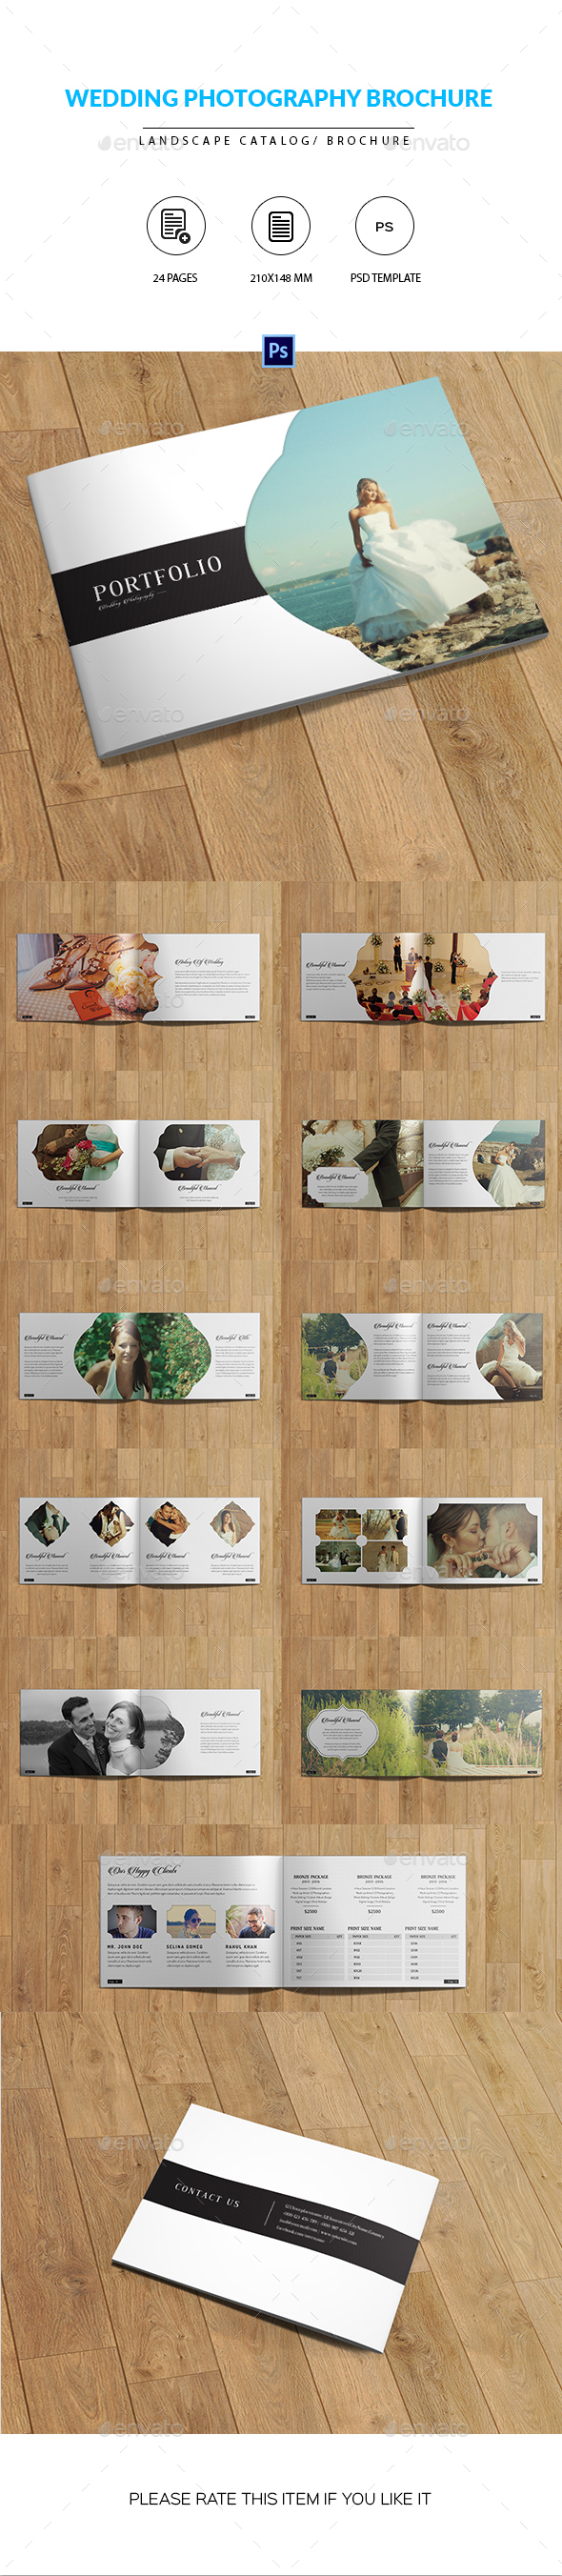 Wedding Photographer Portfolio Catalog/Brochure - Catalogs Brochures